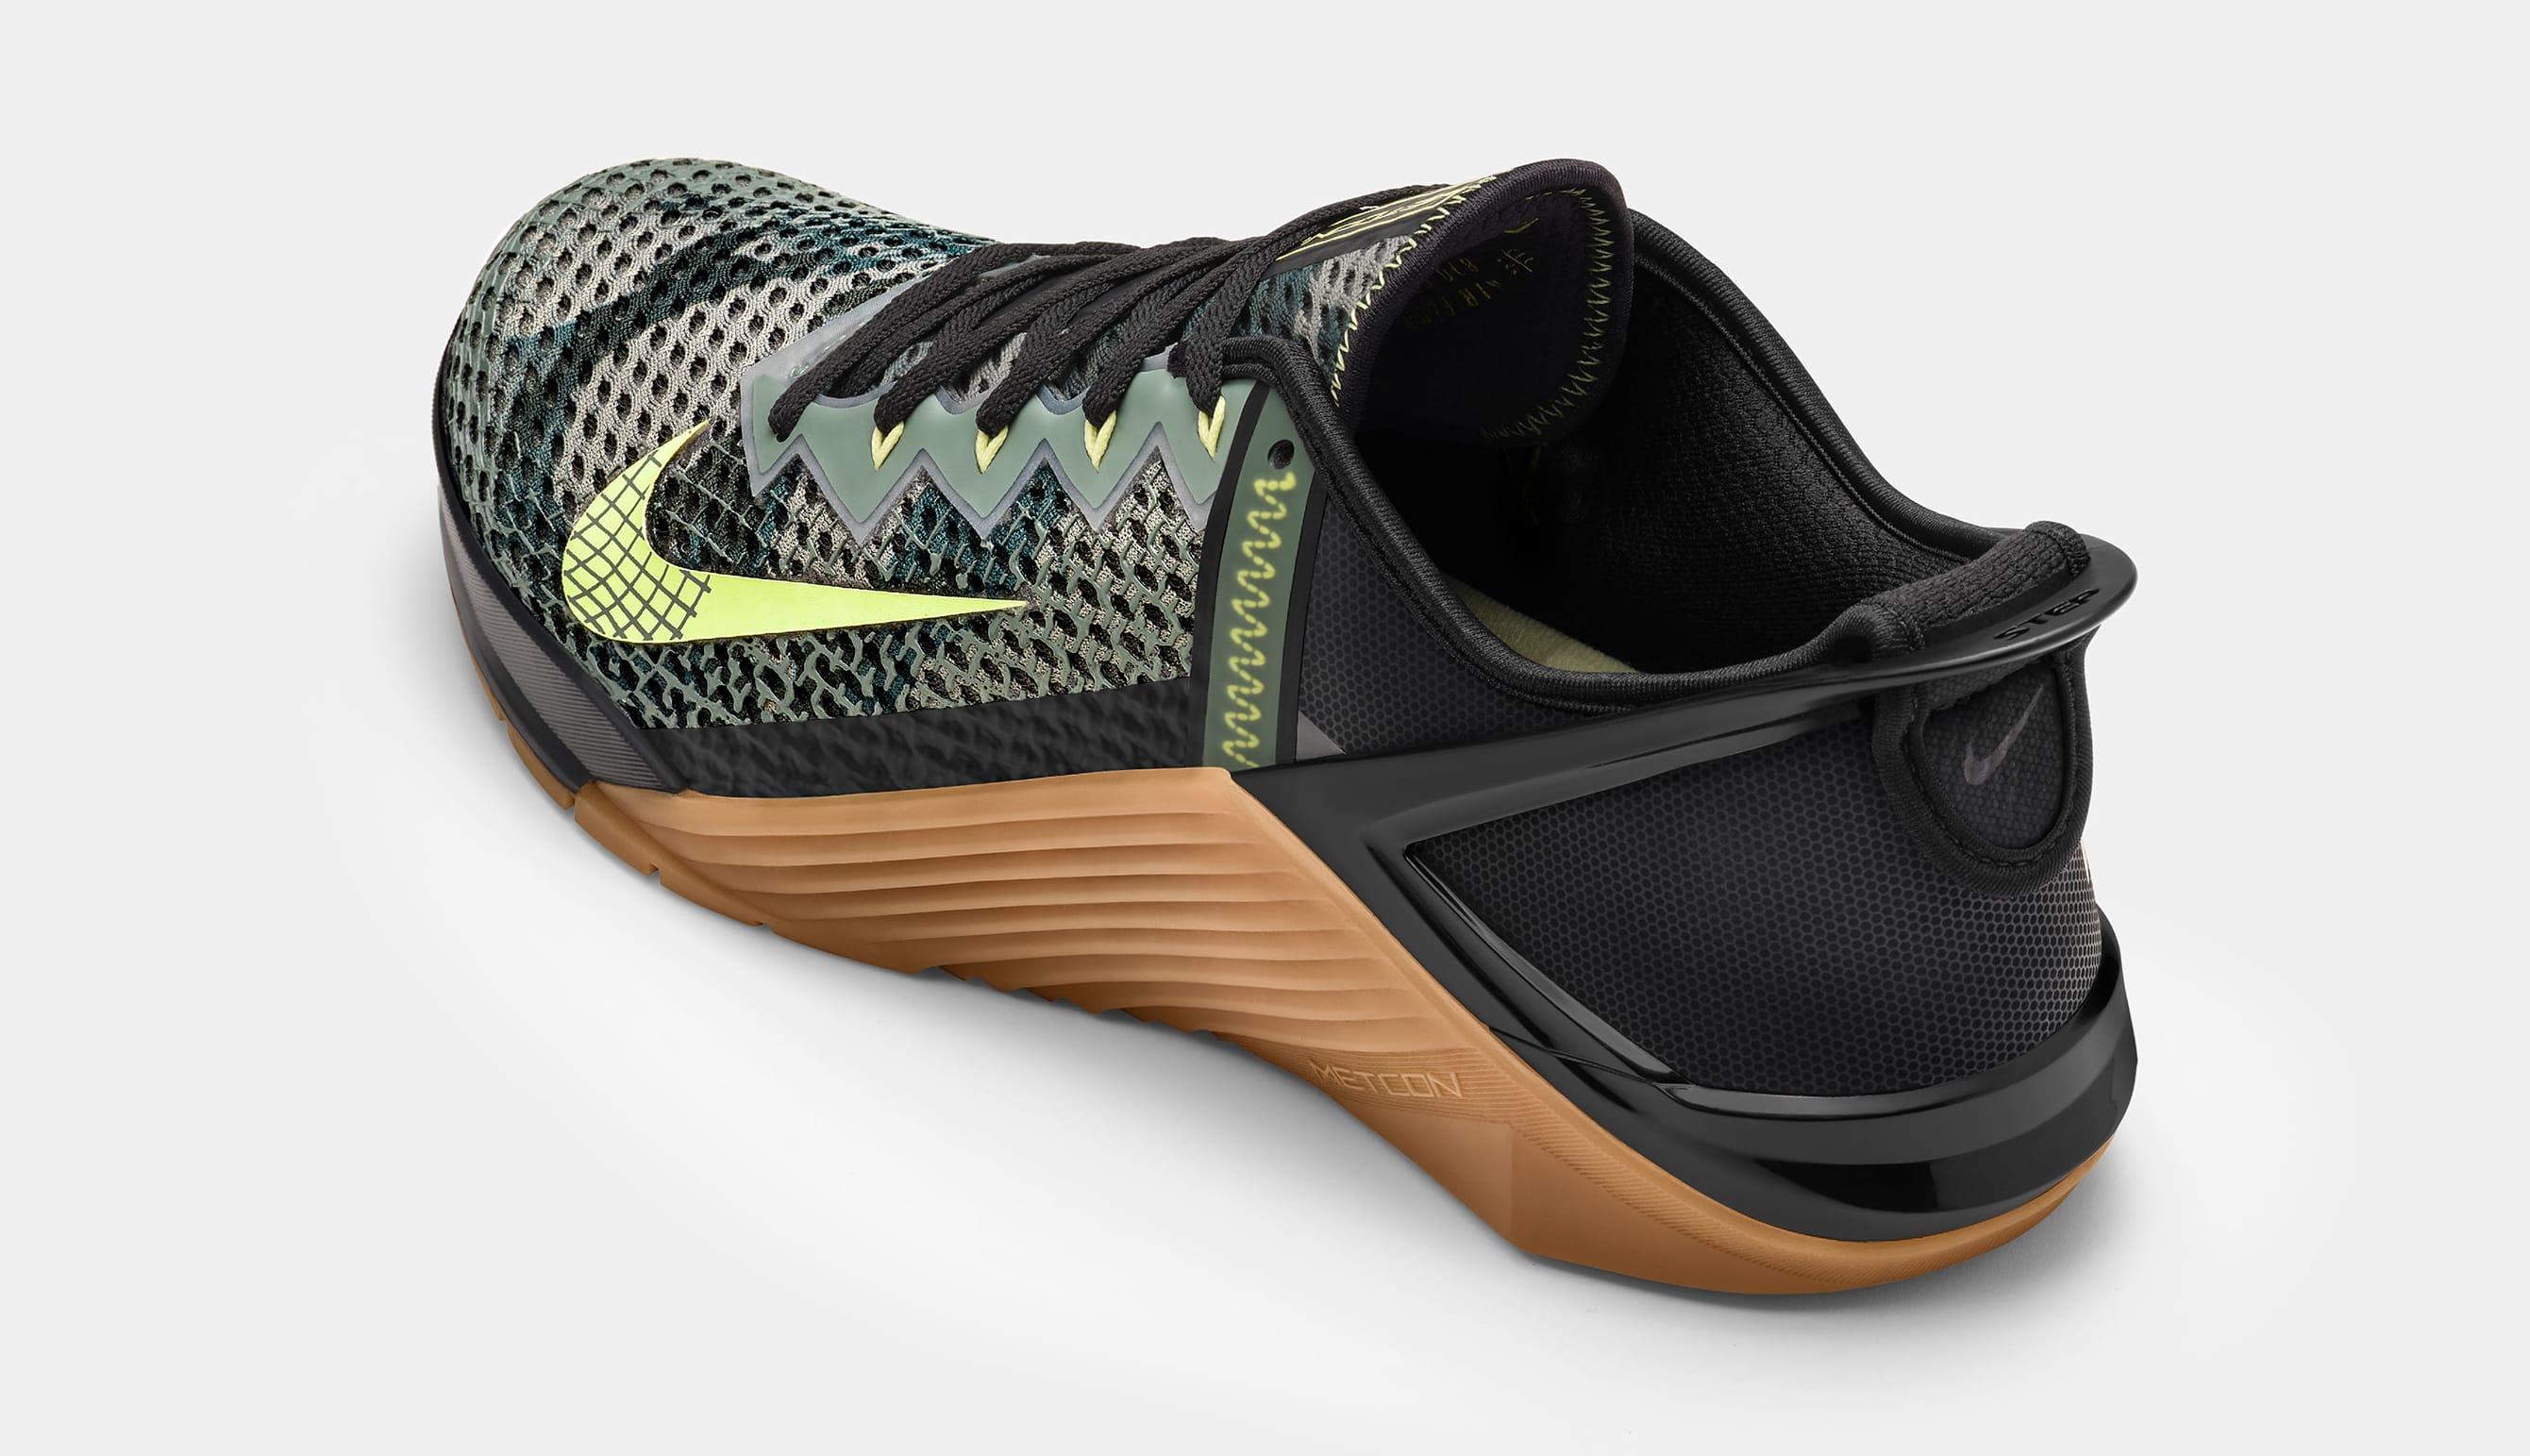 Nike MetCon 6 FlyEase Heel